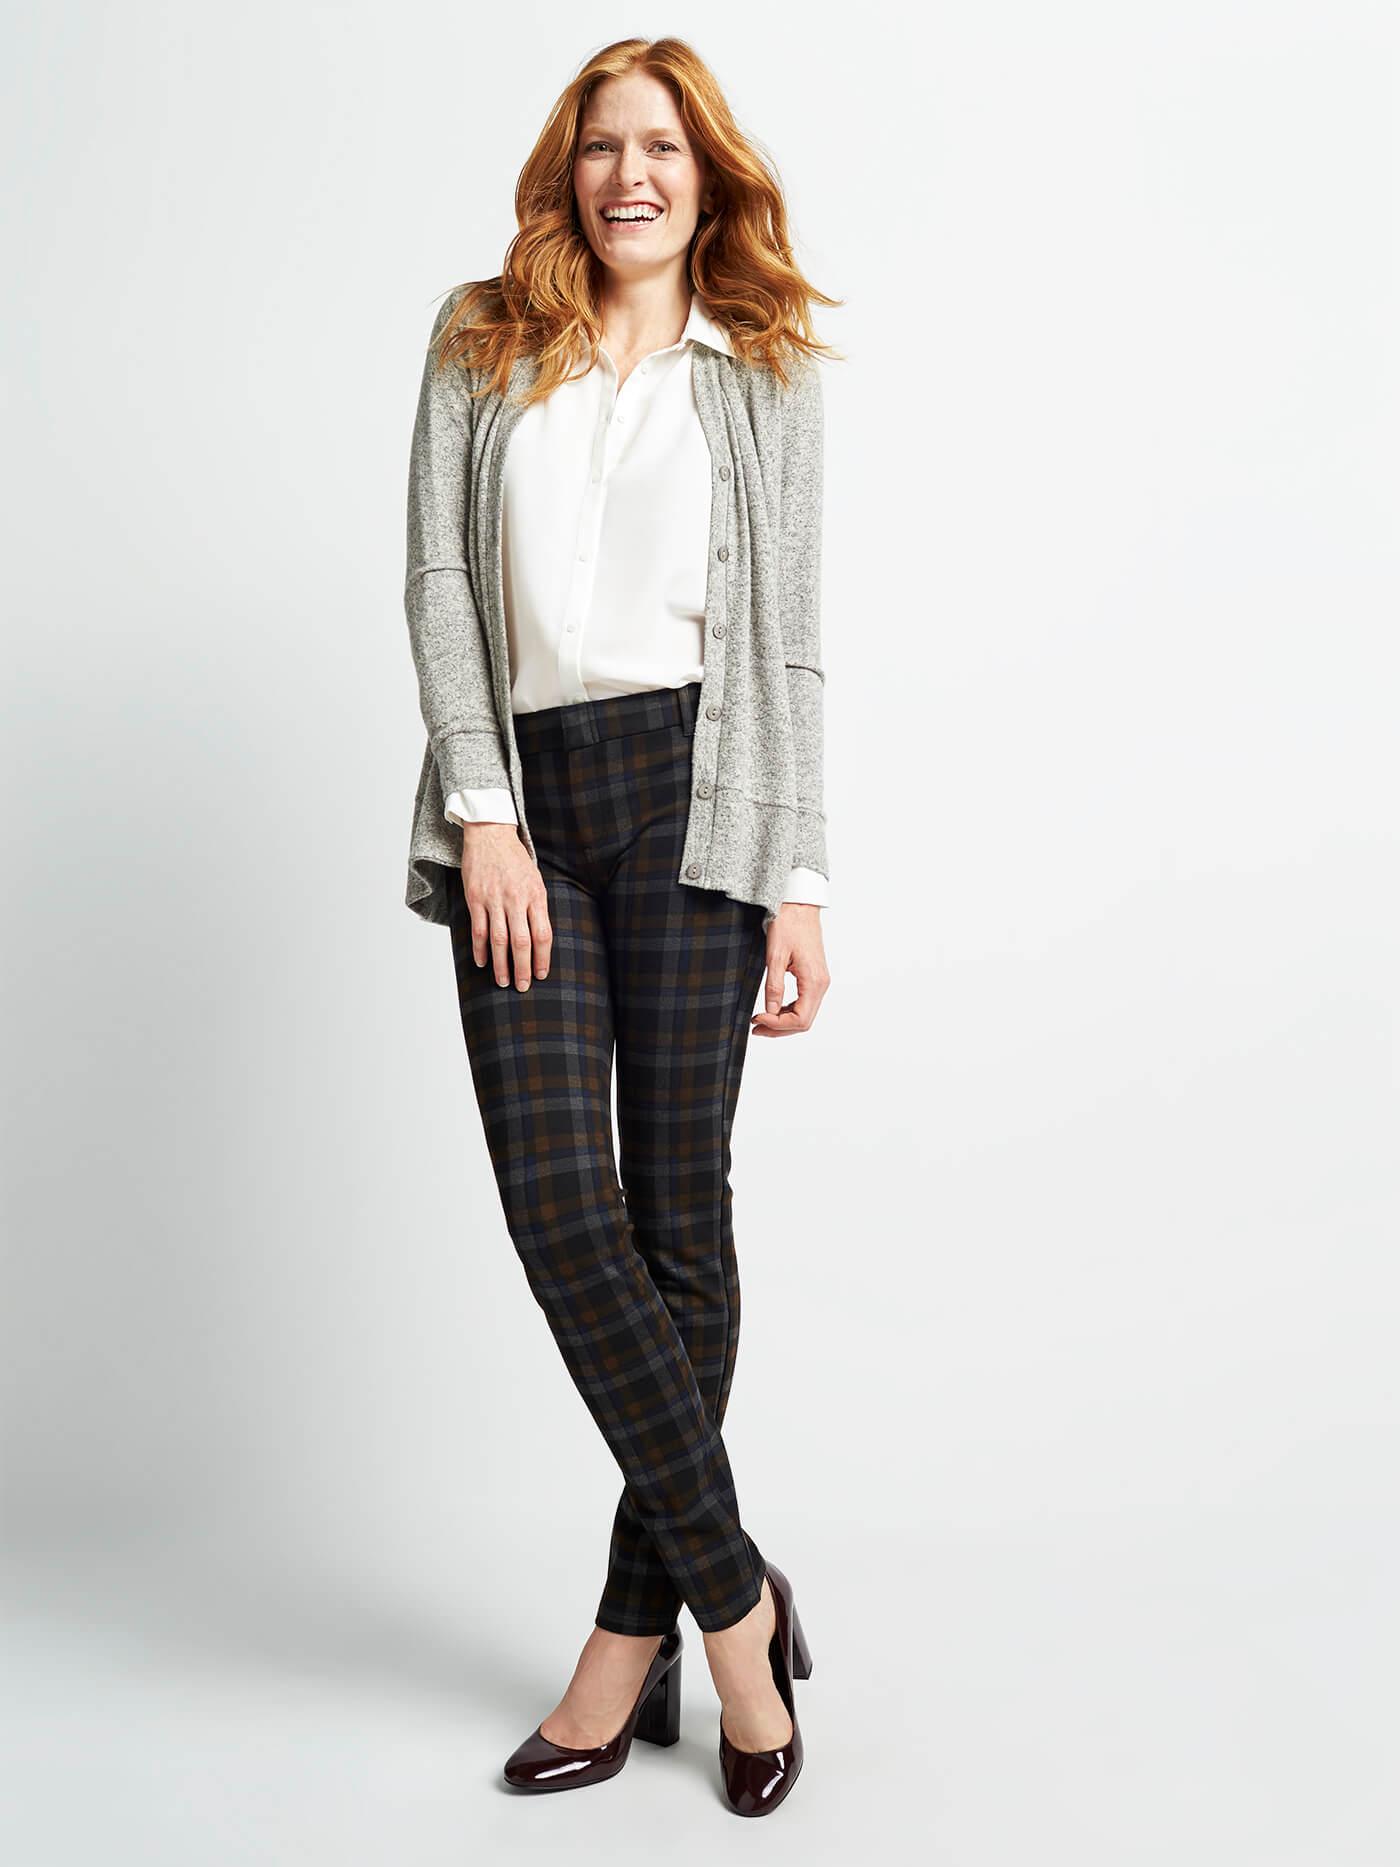 Dress up your boyfriend - Dress Up Work Trousers